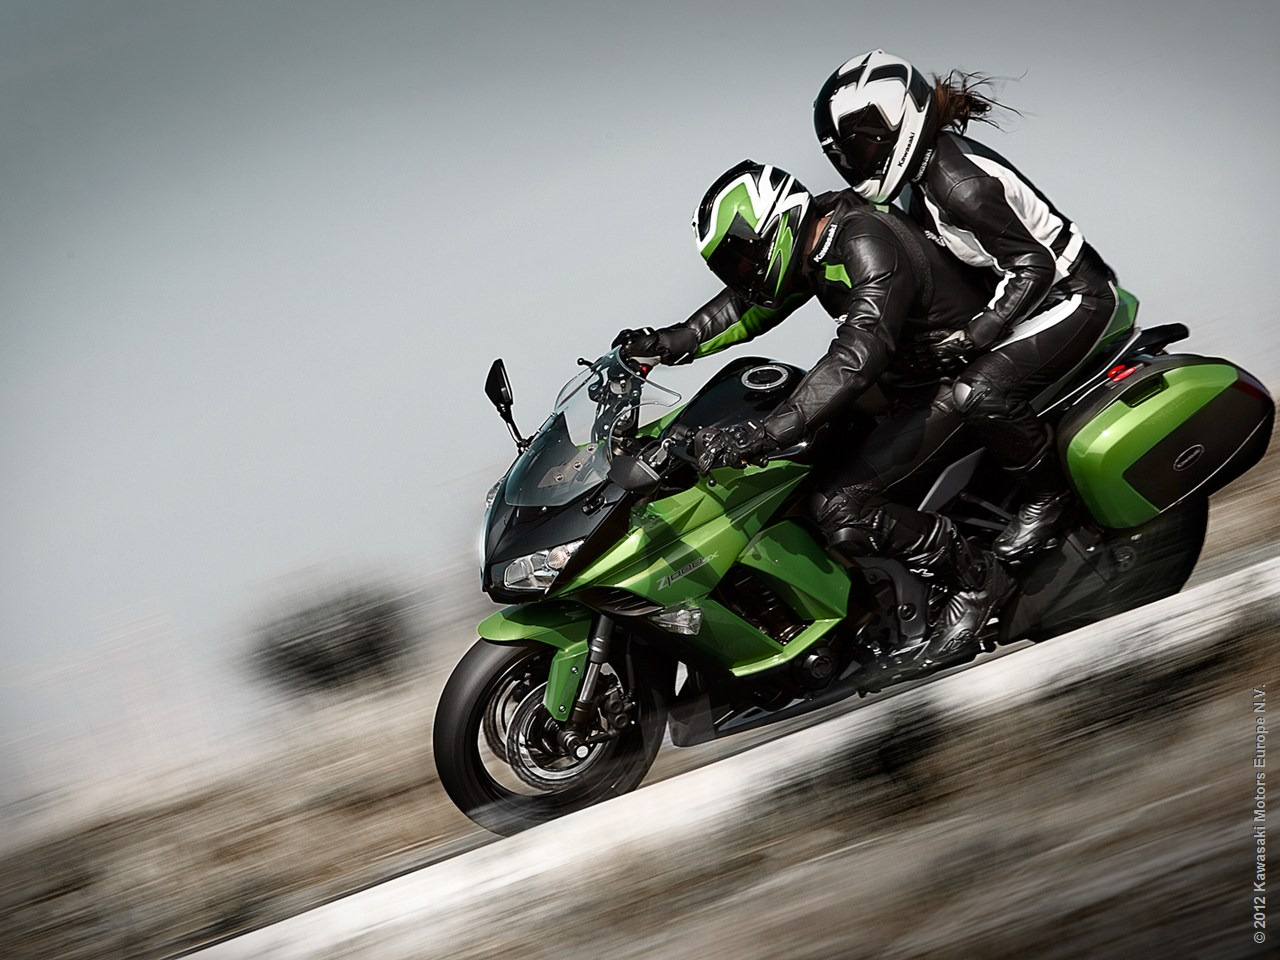 2013 Kawasaki Z1000sx Is An Awesome Sport Touring Machine